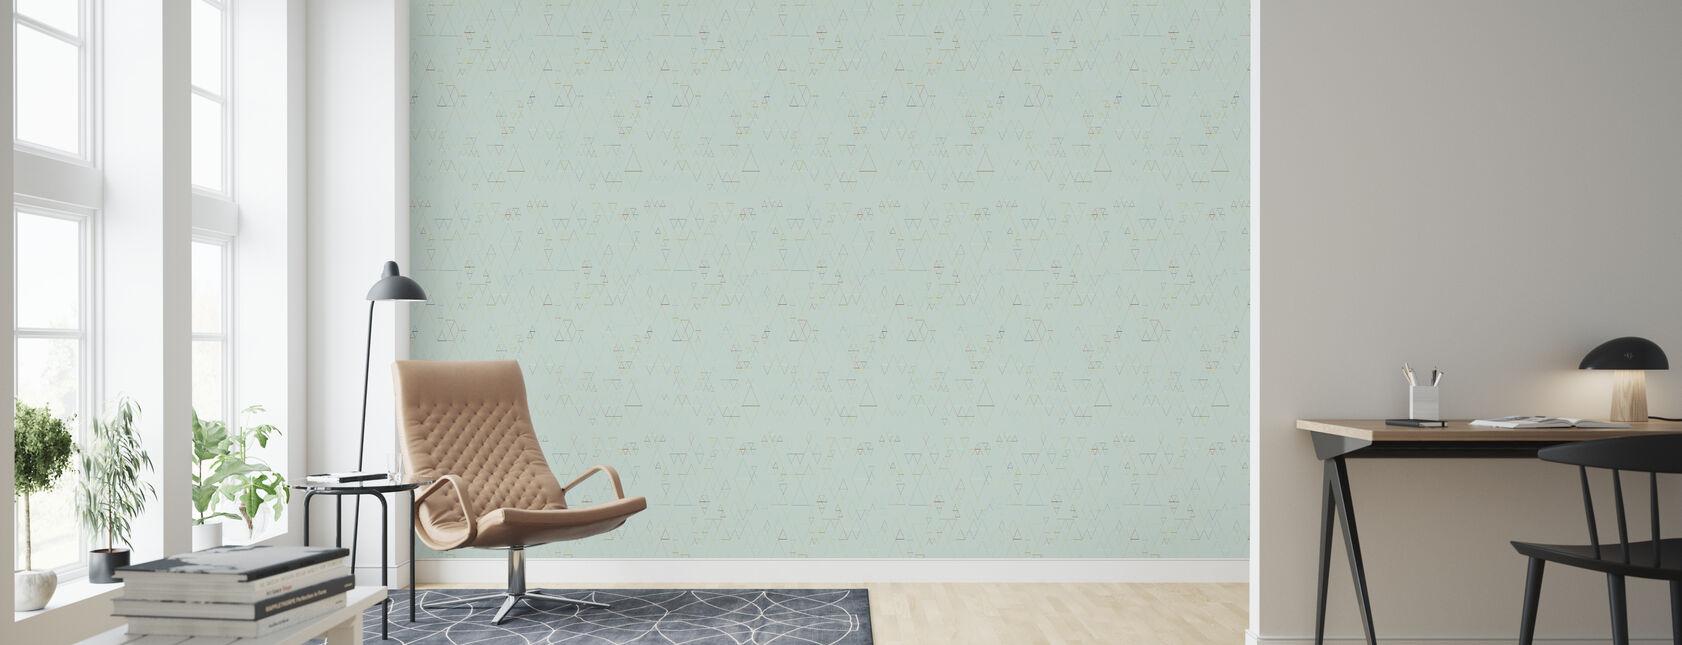 Retroline Mint - Wallpaper - Living Room